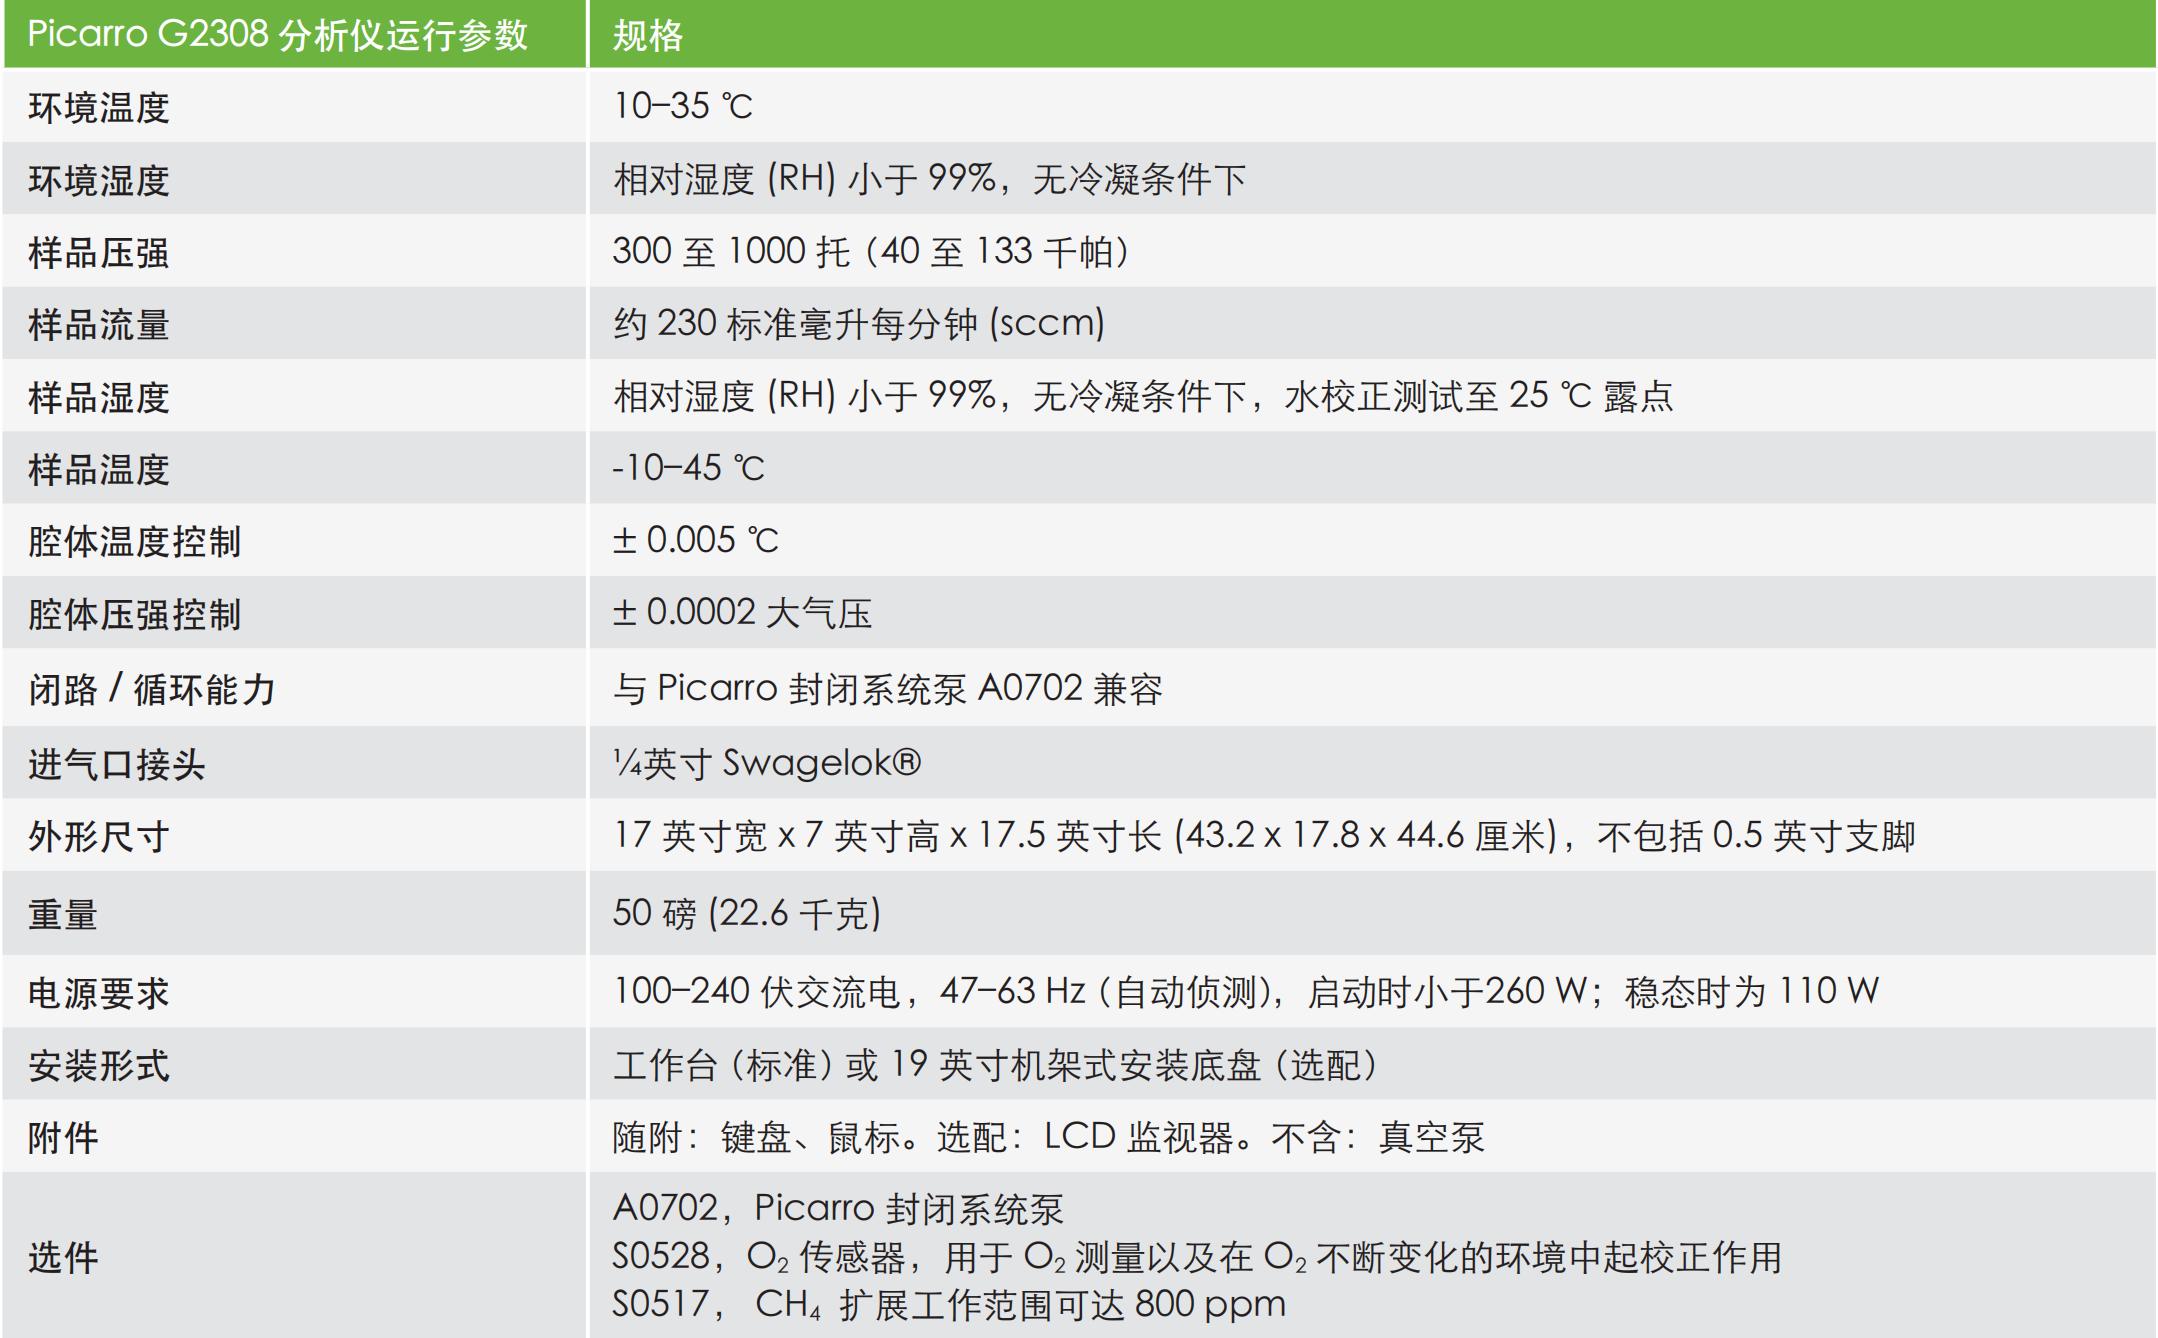 Picarro_G2308 Chinese Datasheet_01.png